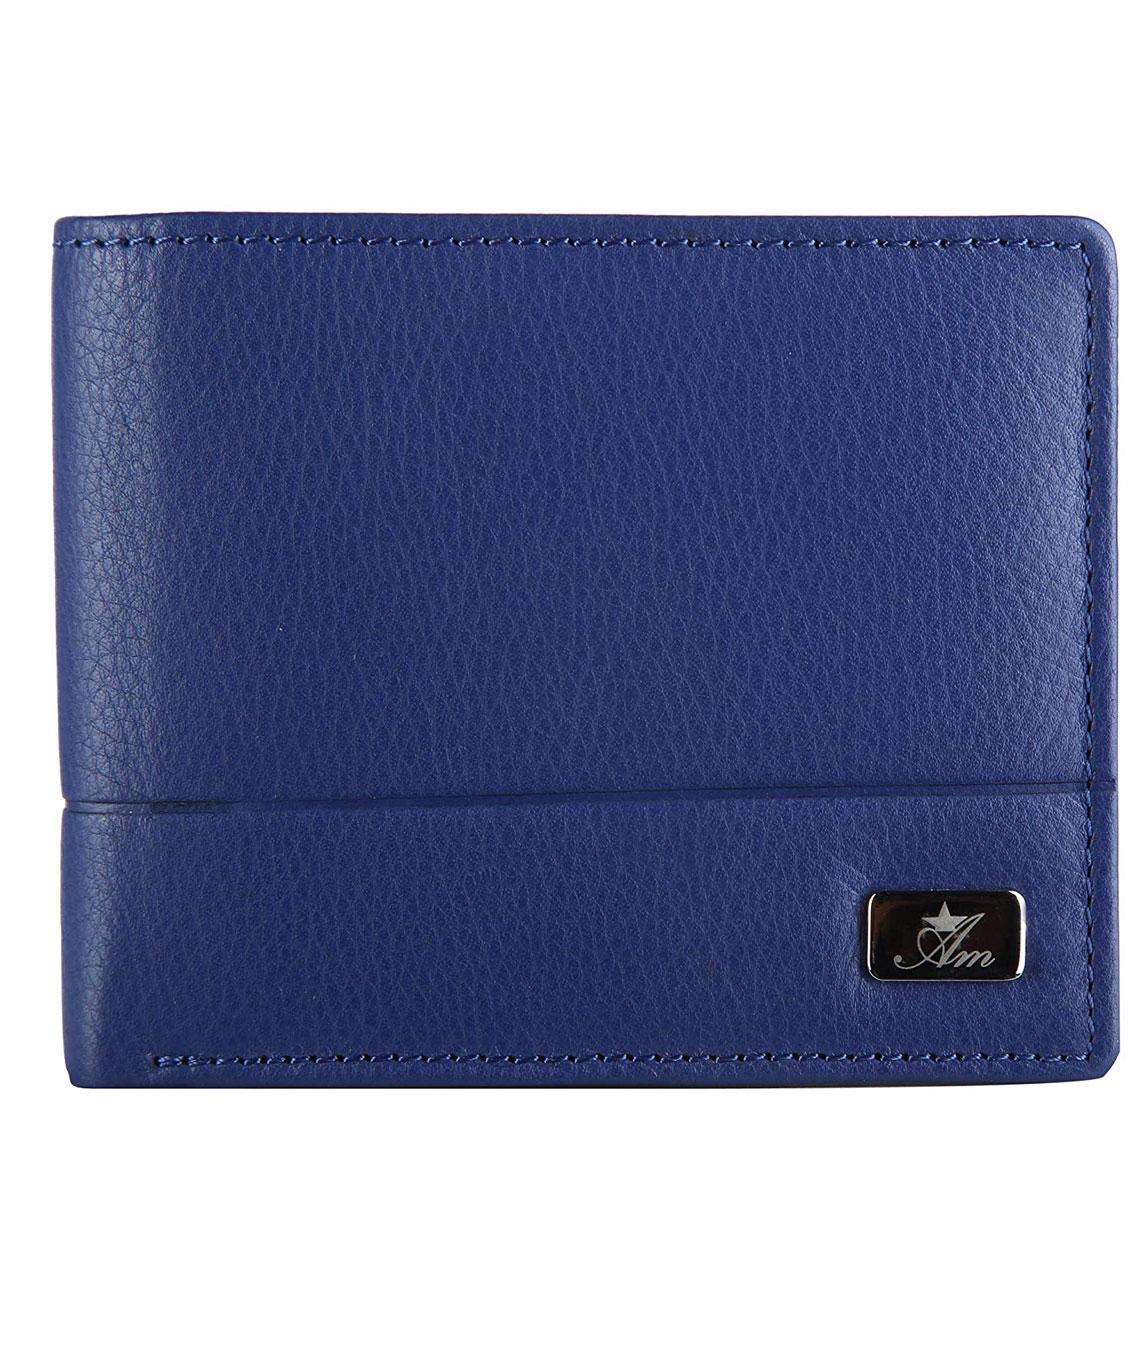 AM LEATHER Men`s Blue Leather Wallet(blue)